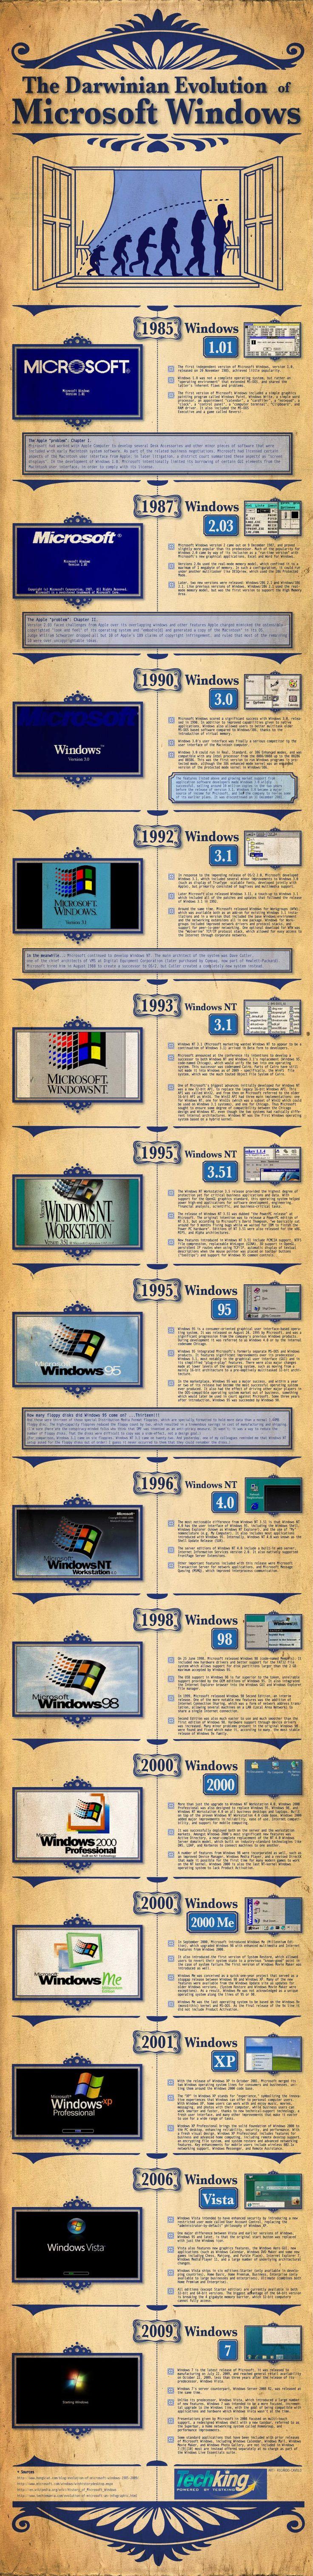 the darwinian evolution of Microsoft Windows